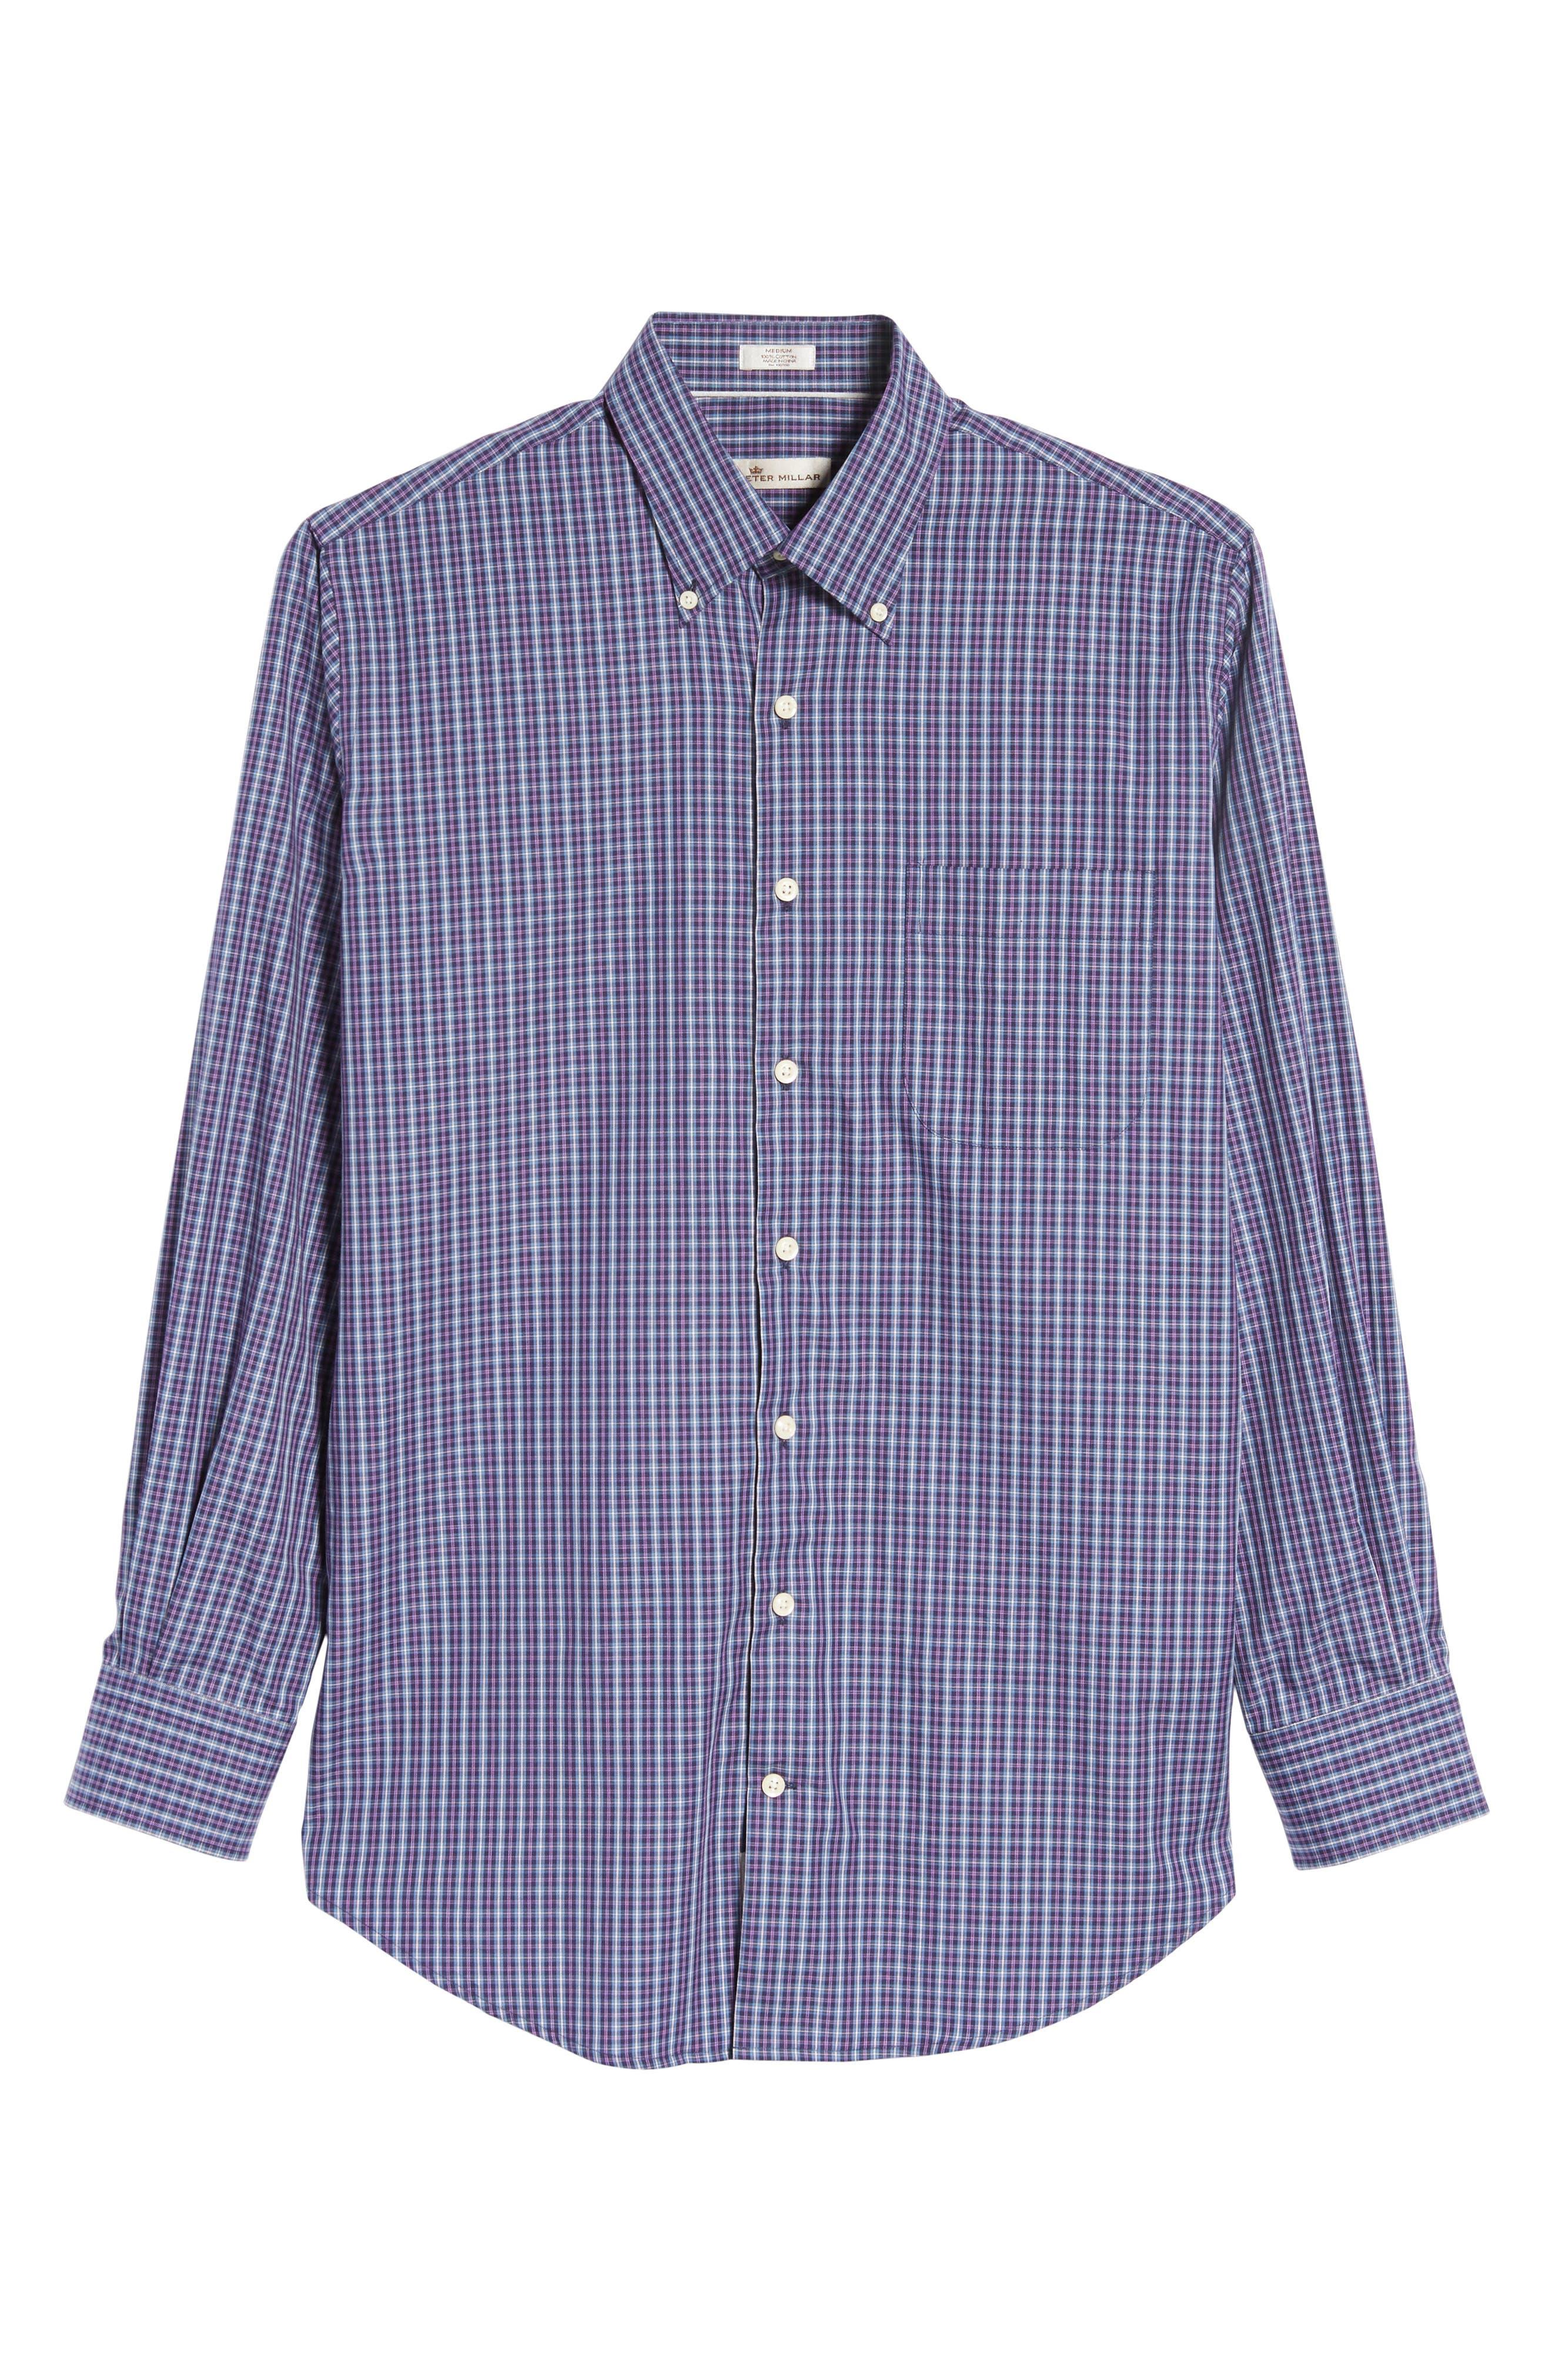 Hillock Regular Fit Plaid Sport Shirt,                             Alternate thumbnail 6, color,